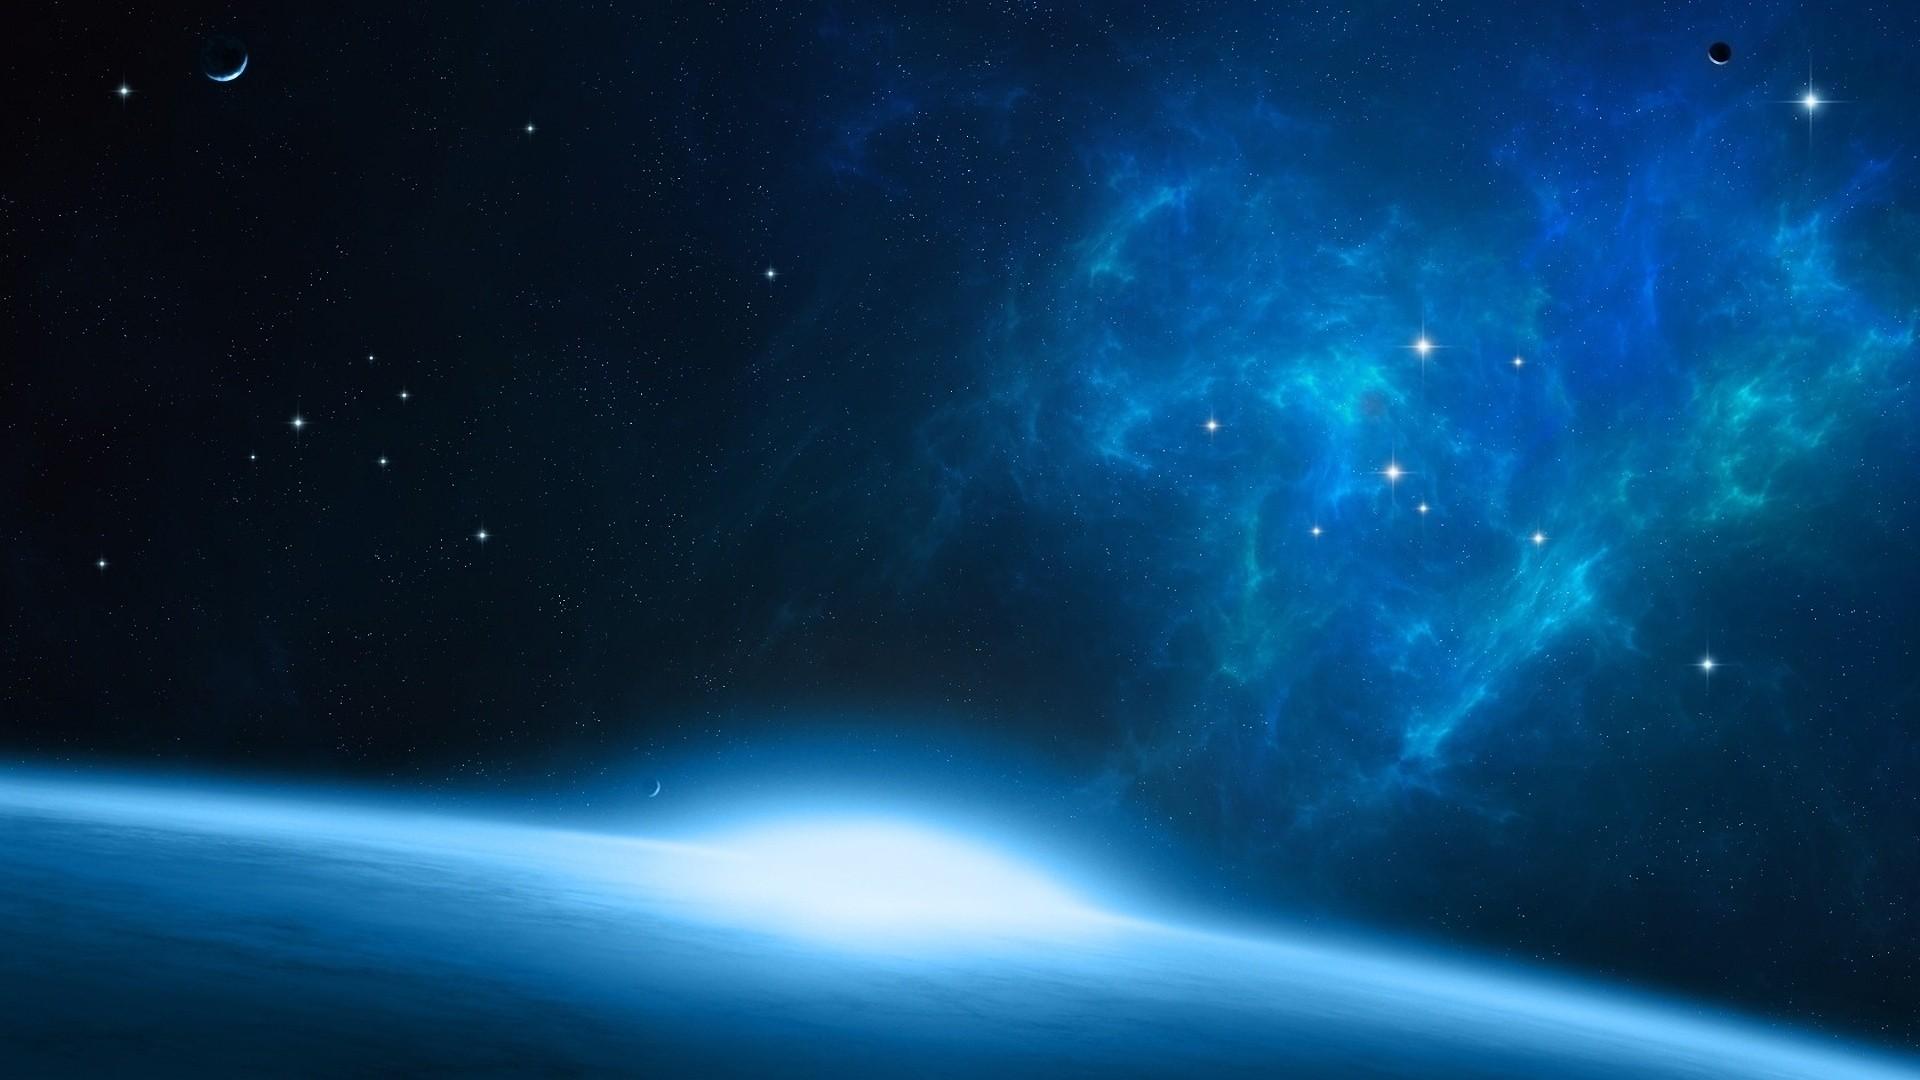 Nebula, black, blue, nebula, space